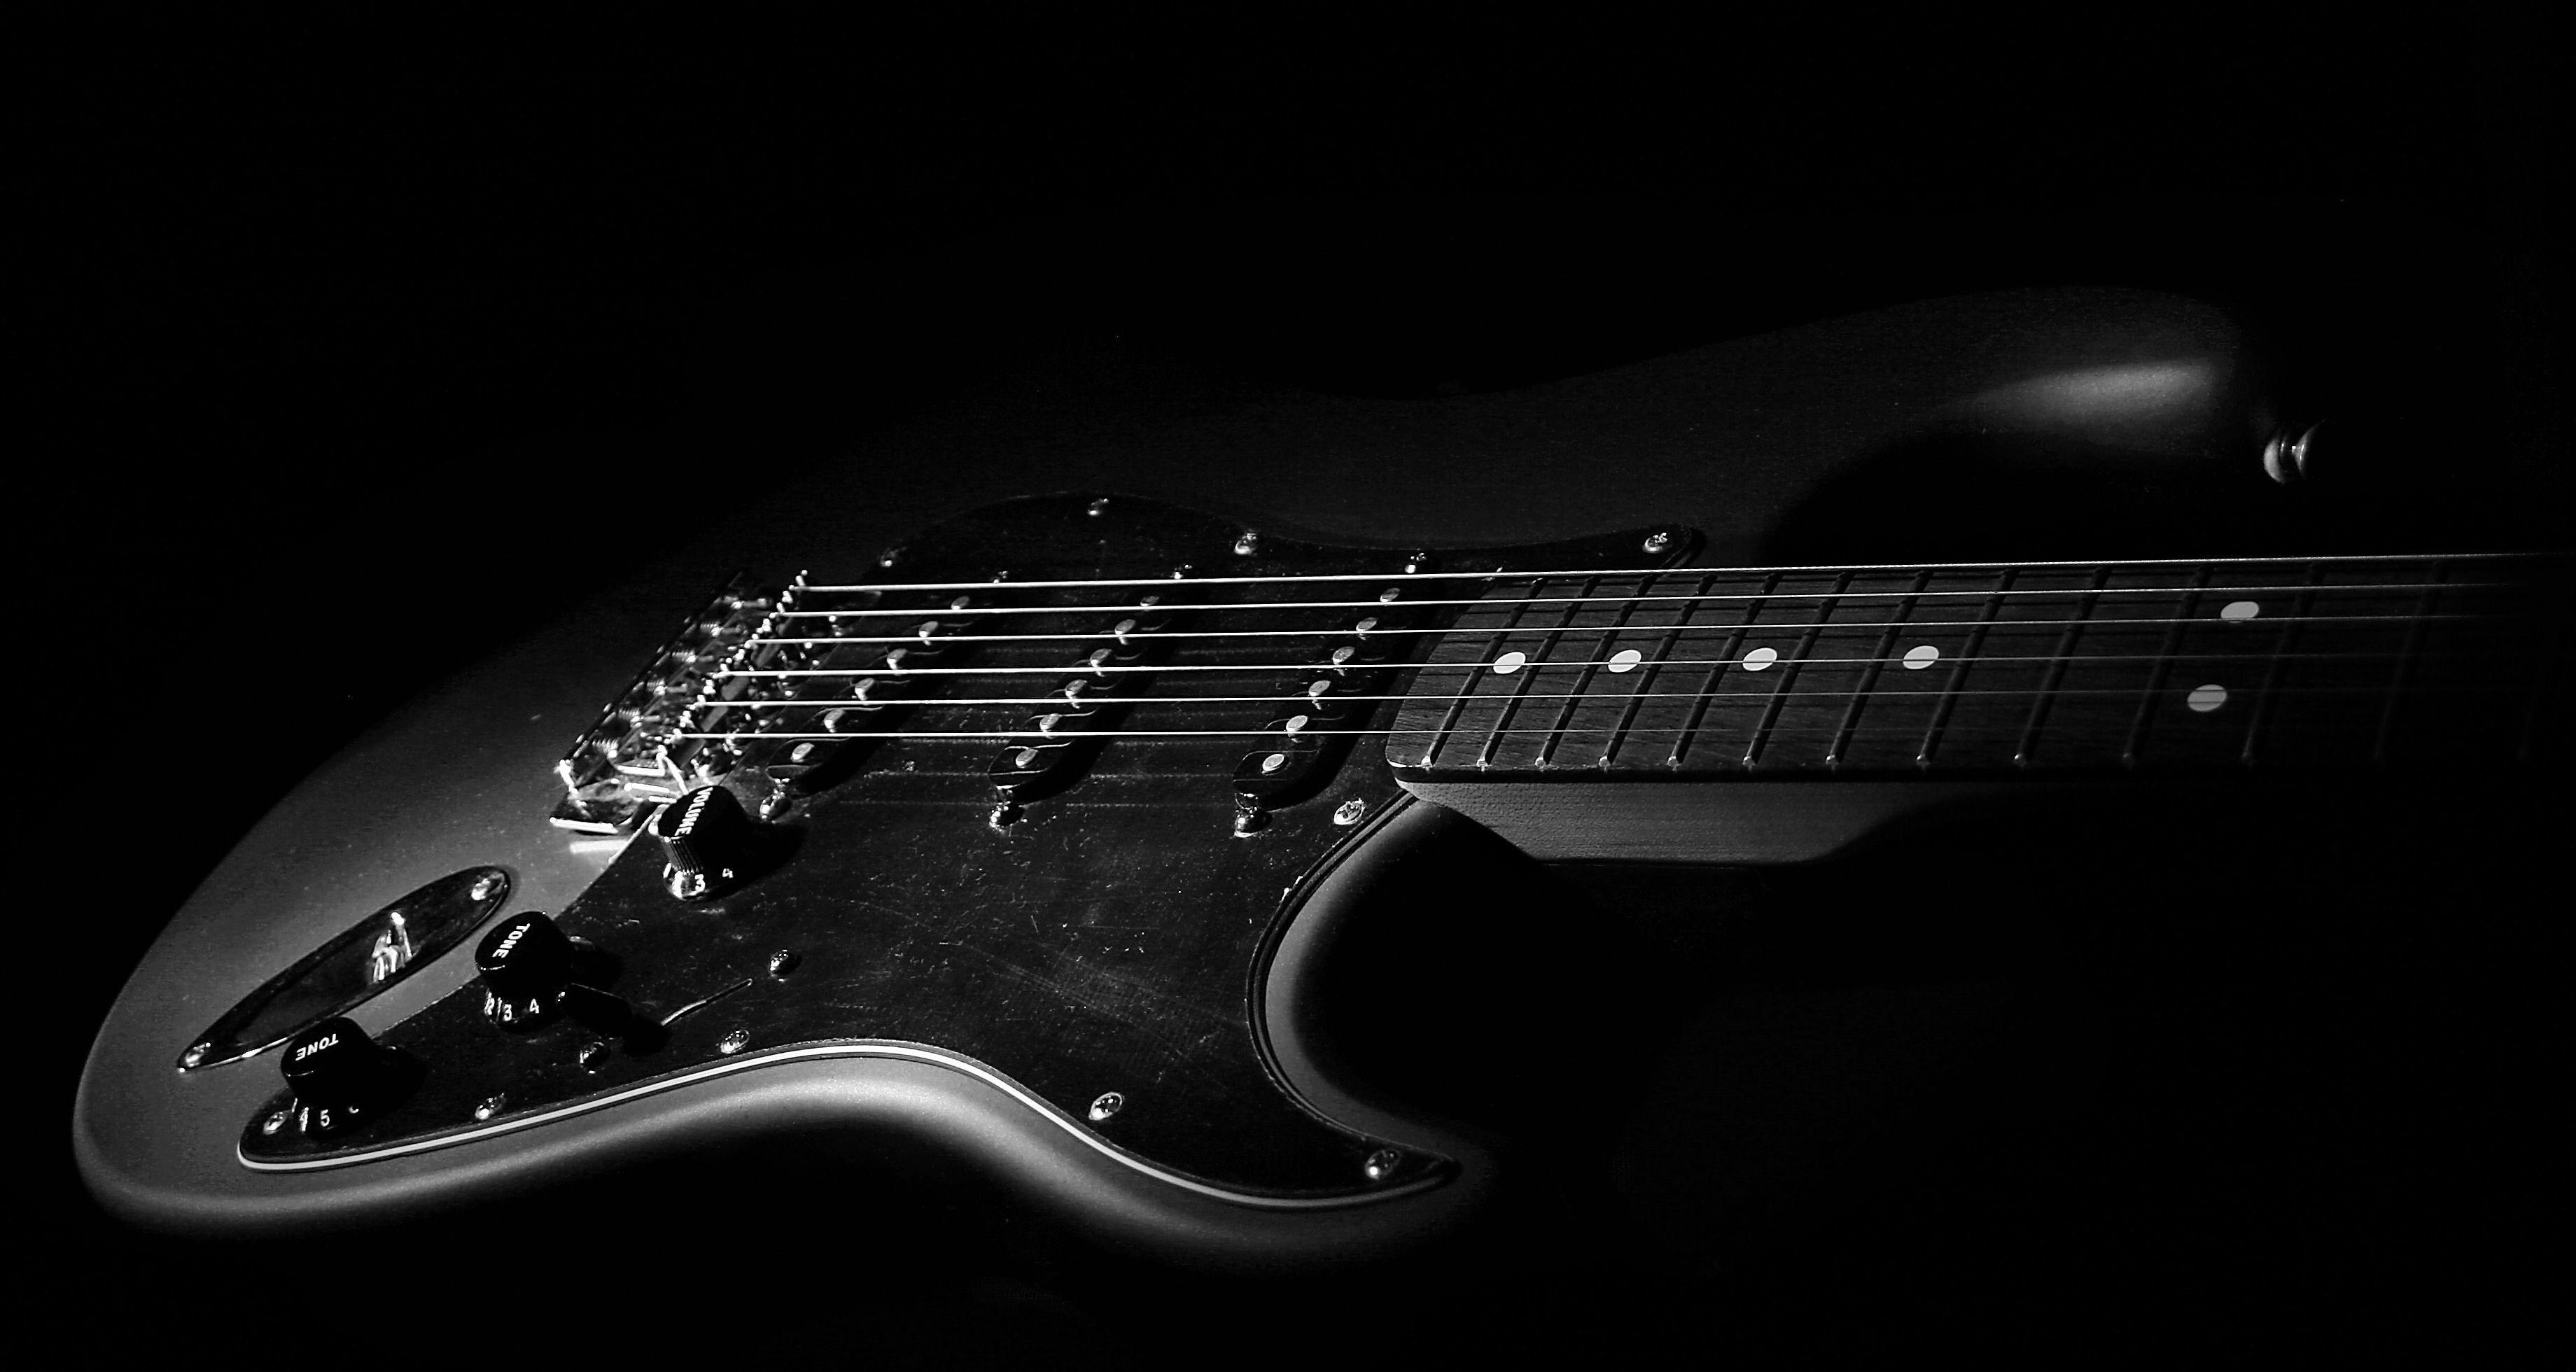 Fender Stratocaster Wallpapers Wallpaper